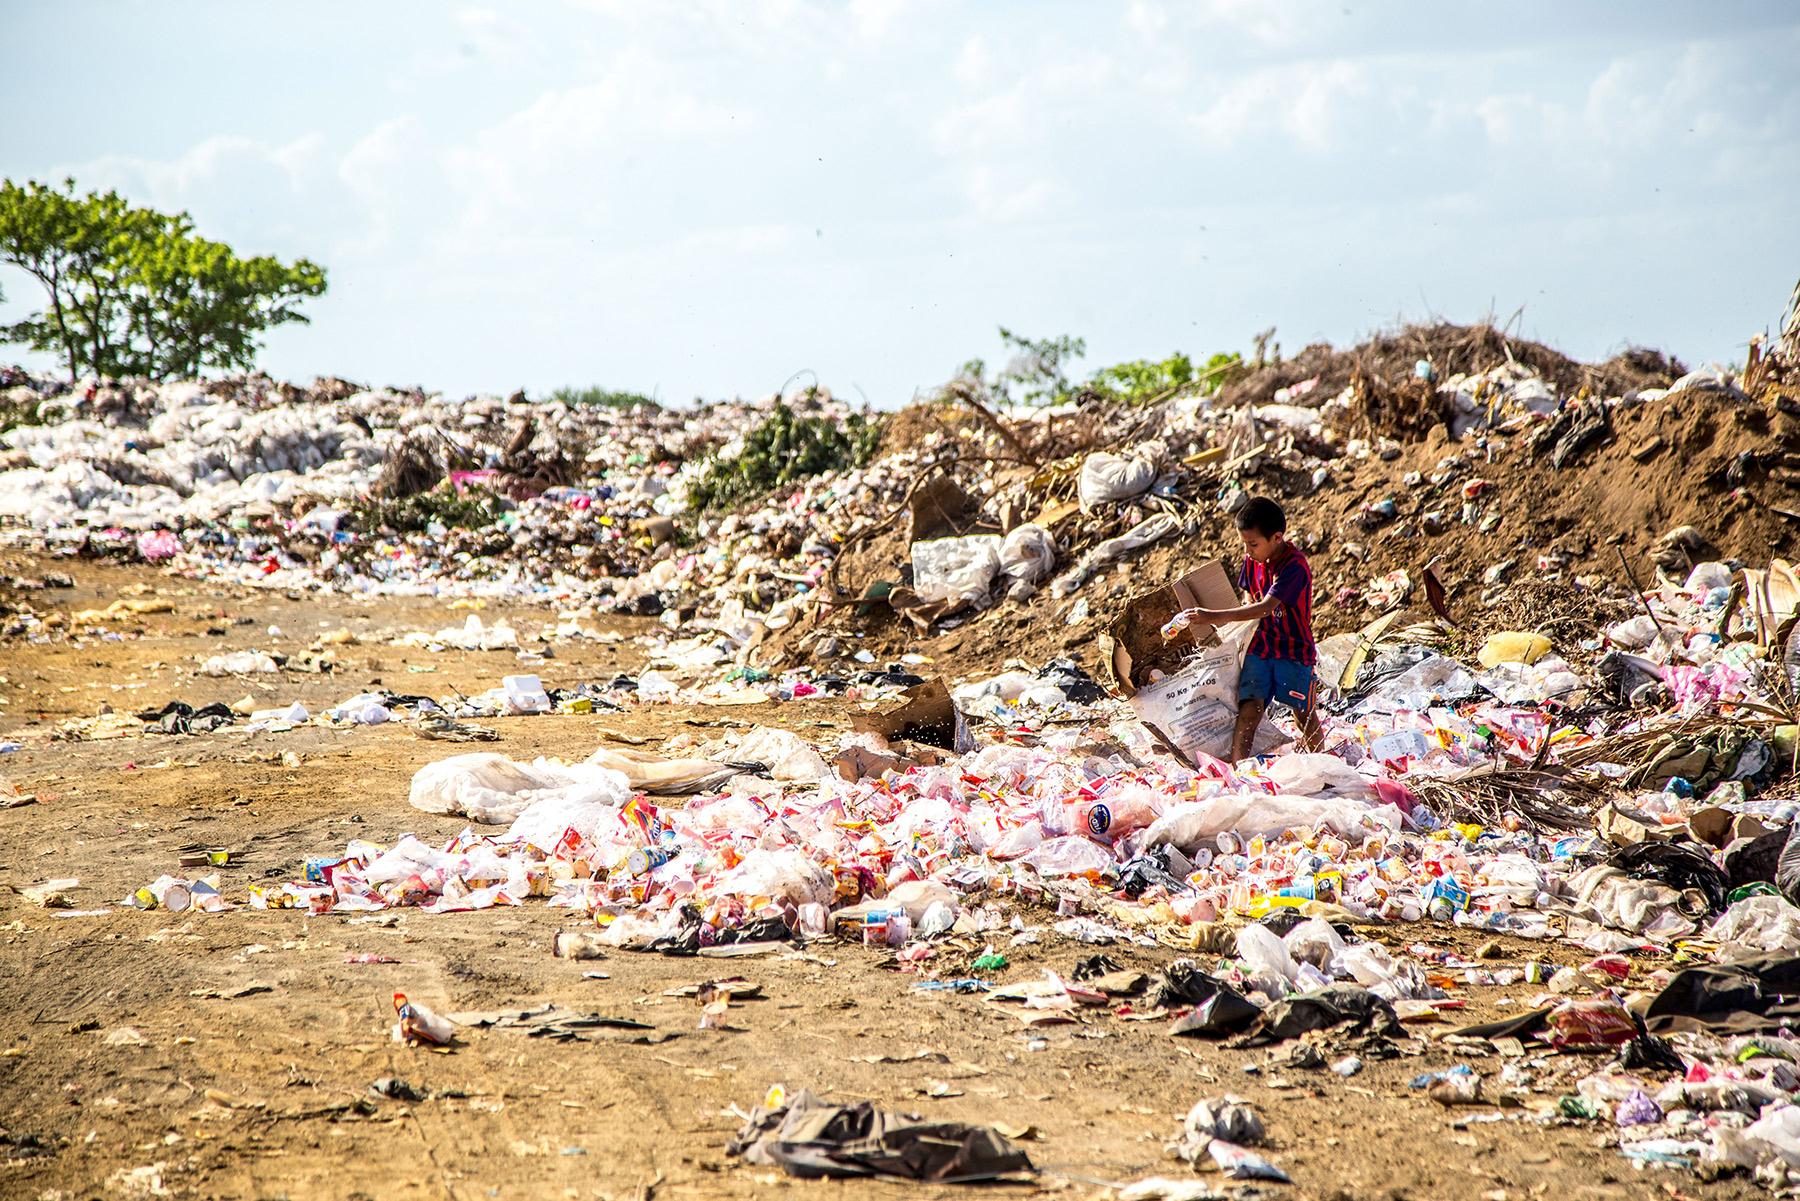 Plastic-Pollution-Straw-Ban-Europe-UK-Bamboo-Straws.jpg